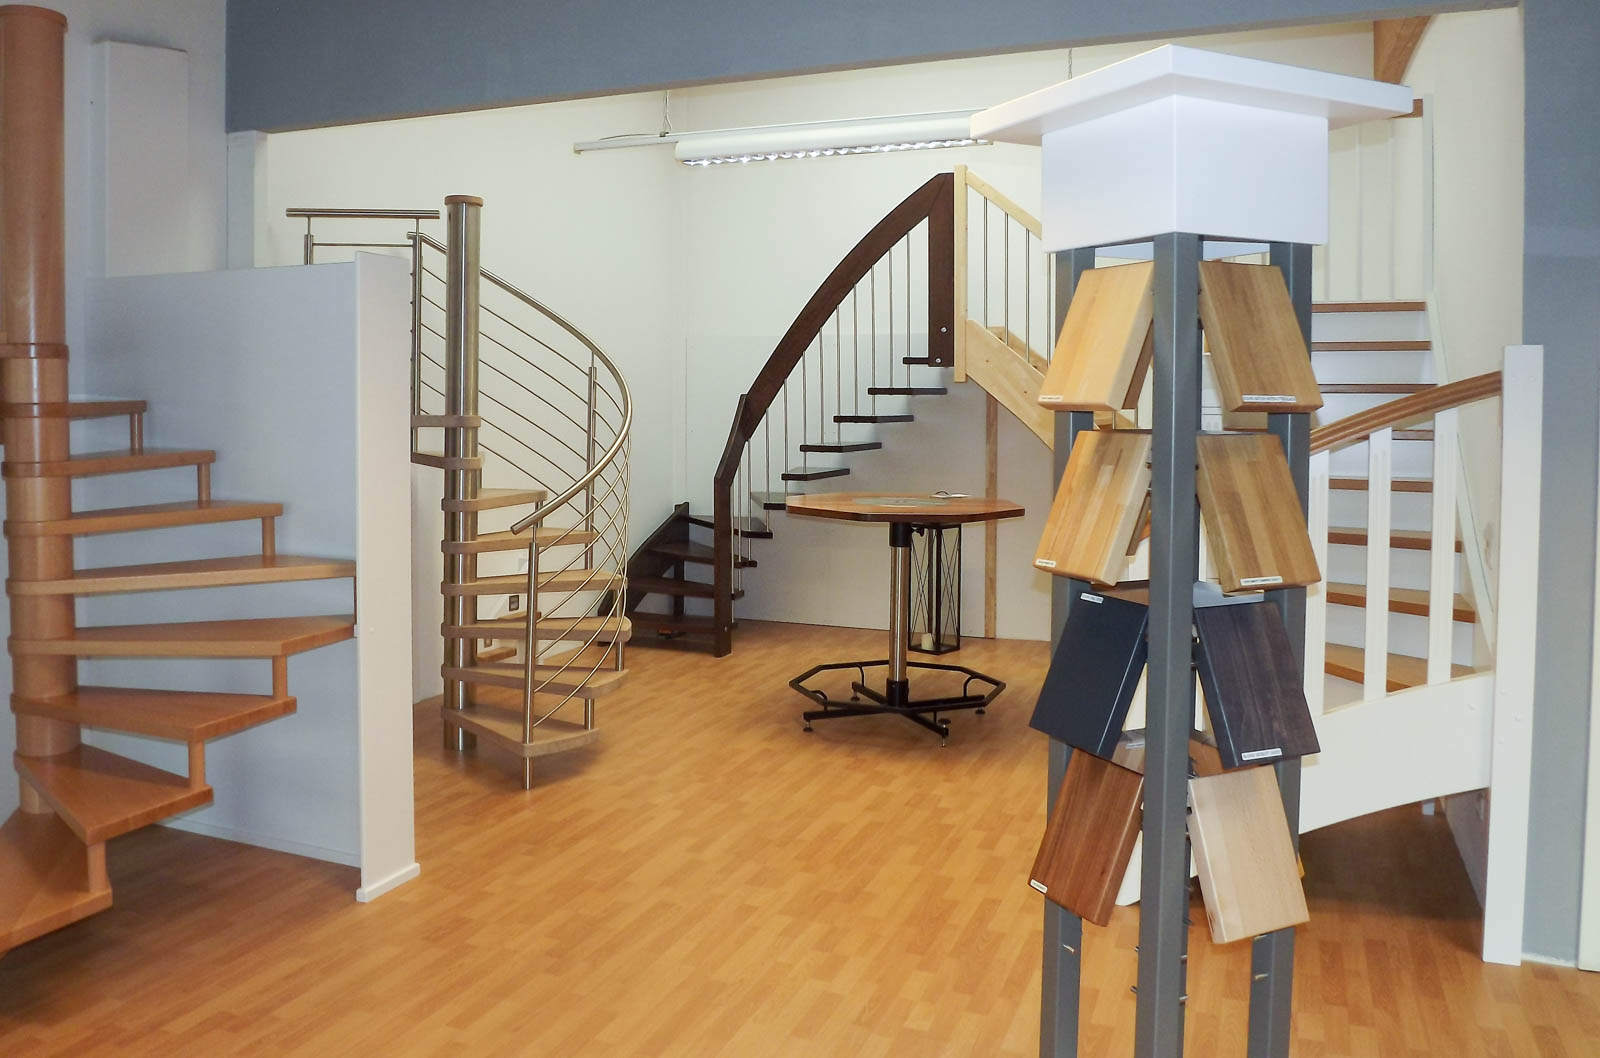 Treppenausstellung in Bochum